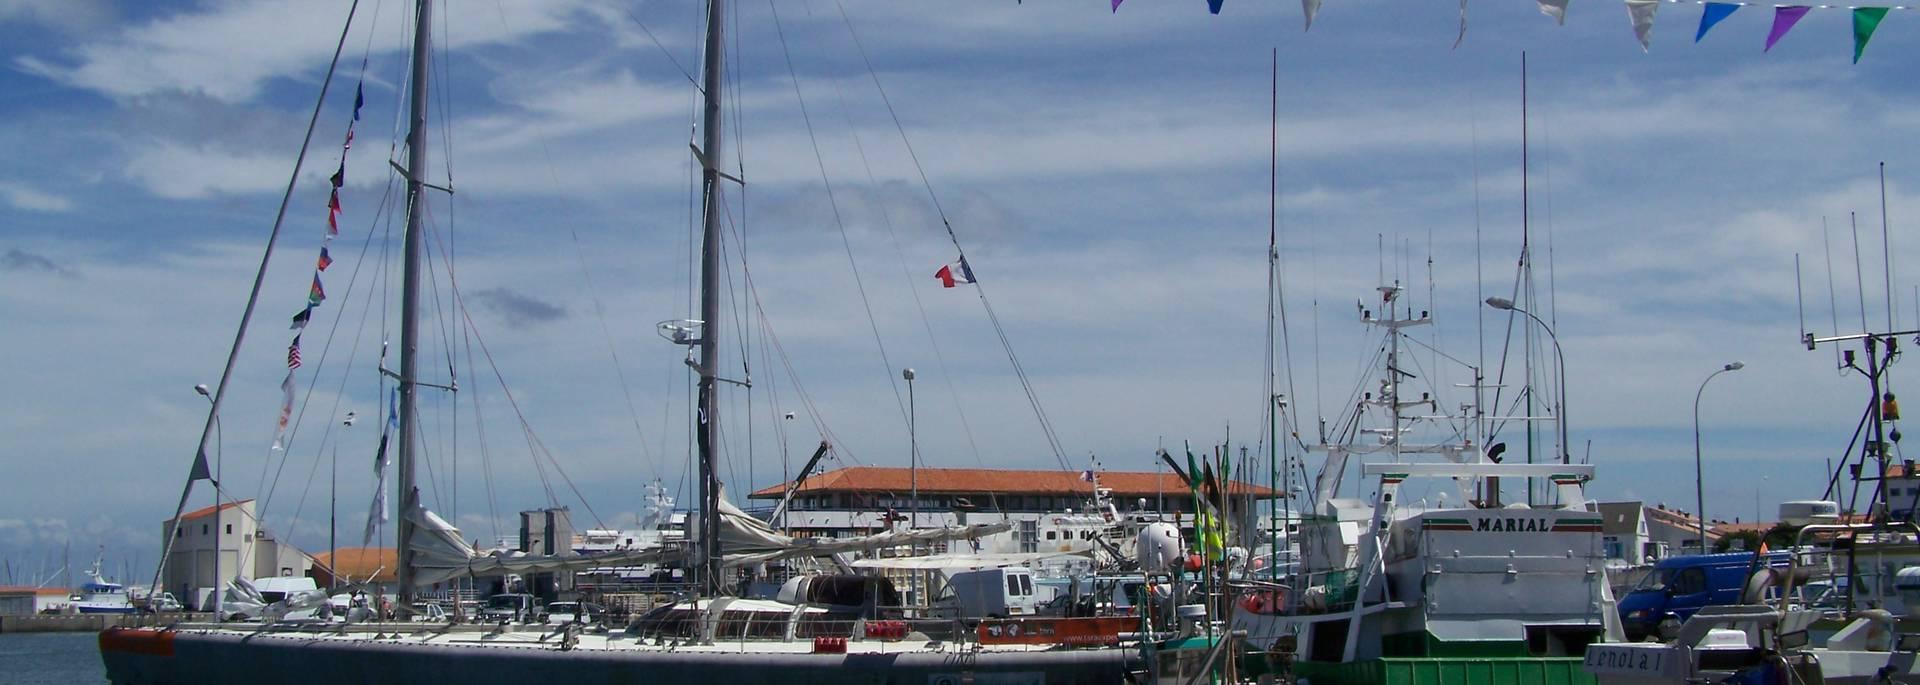 Fahrradausflug - Port Joinville, Ile d'yeu